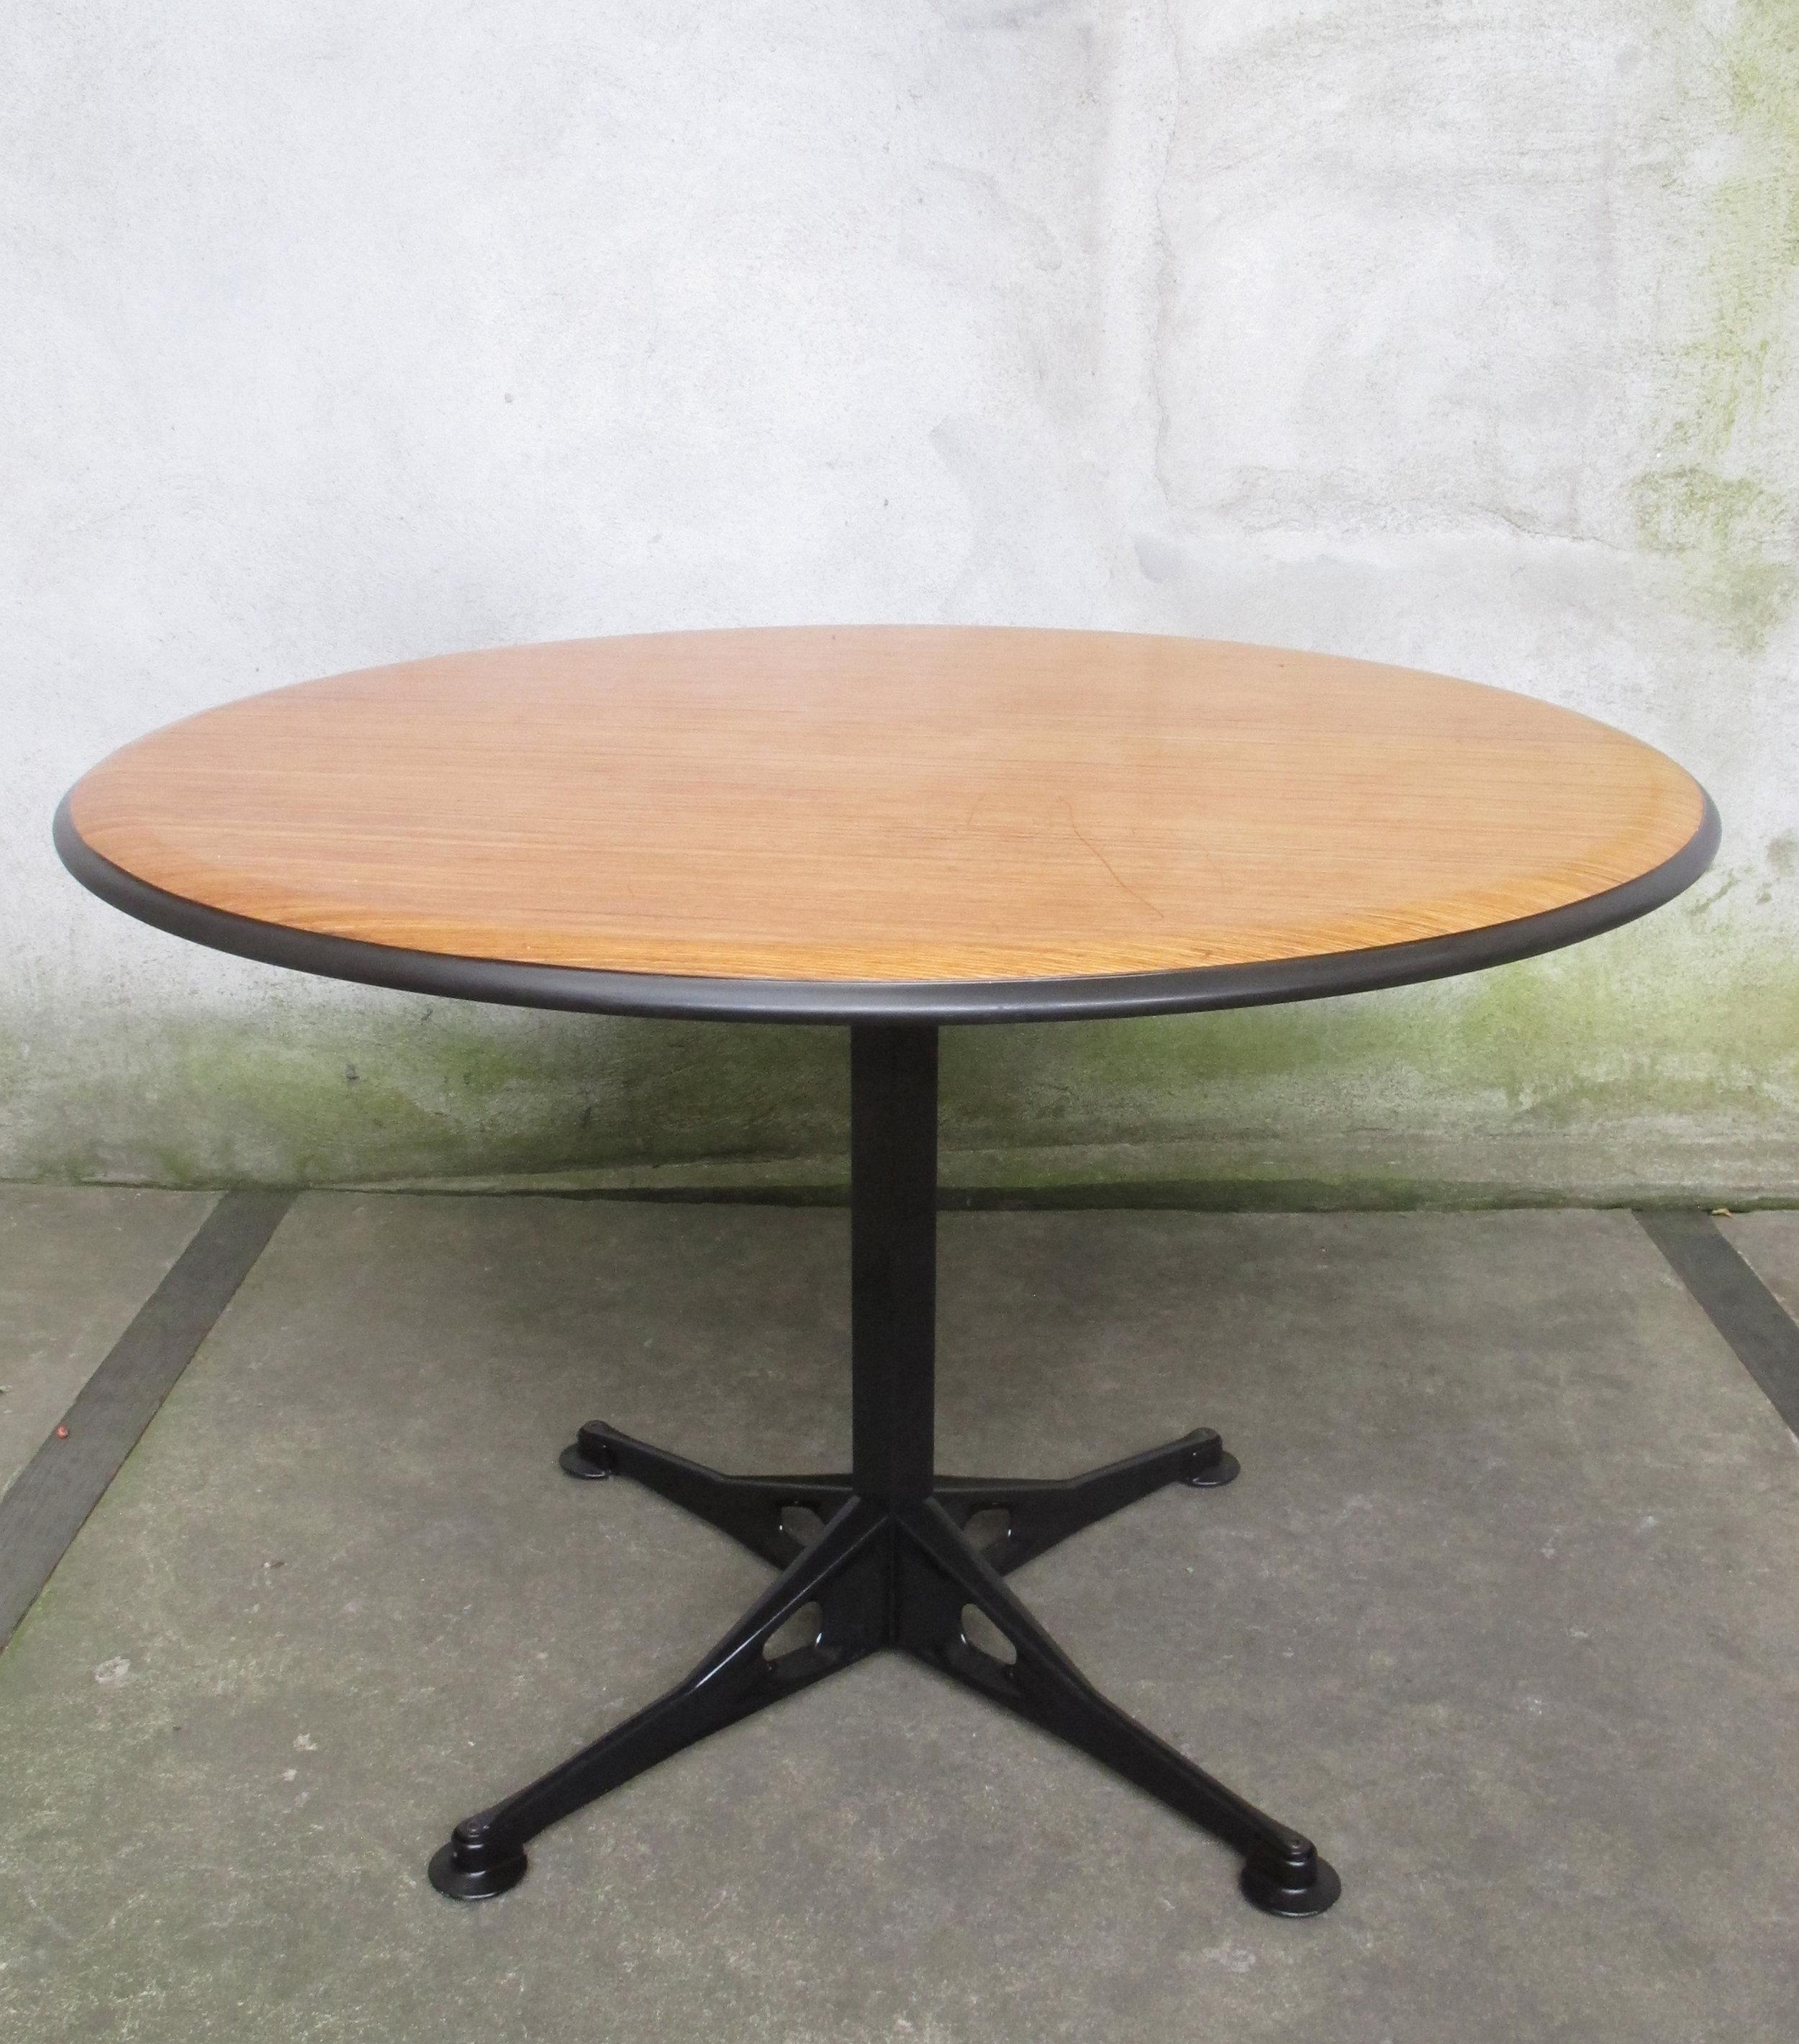 MID CENTURY HERMAN MILLER ROUND DINING TABLE